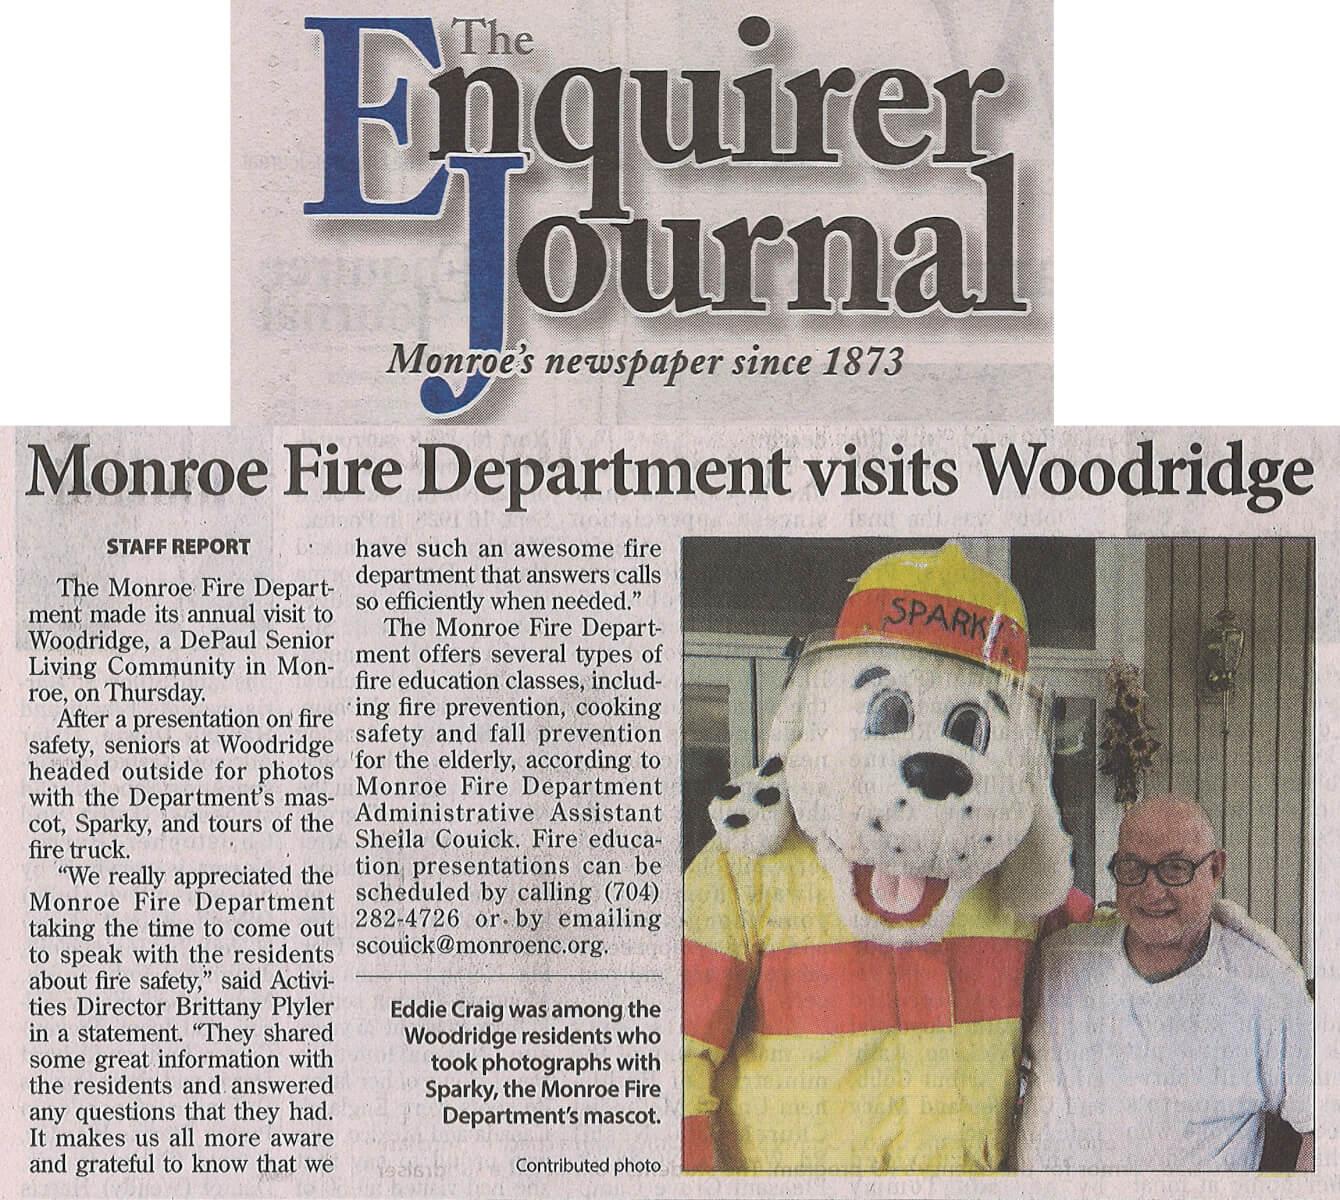 Woodridge Fire Department Visit, 12.2.18 Enquirer Journal